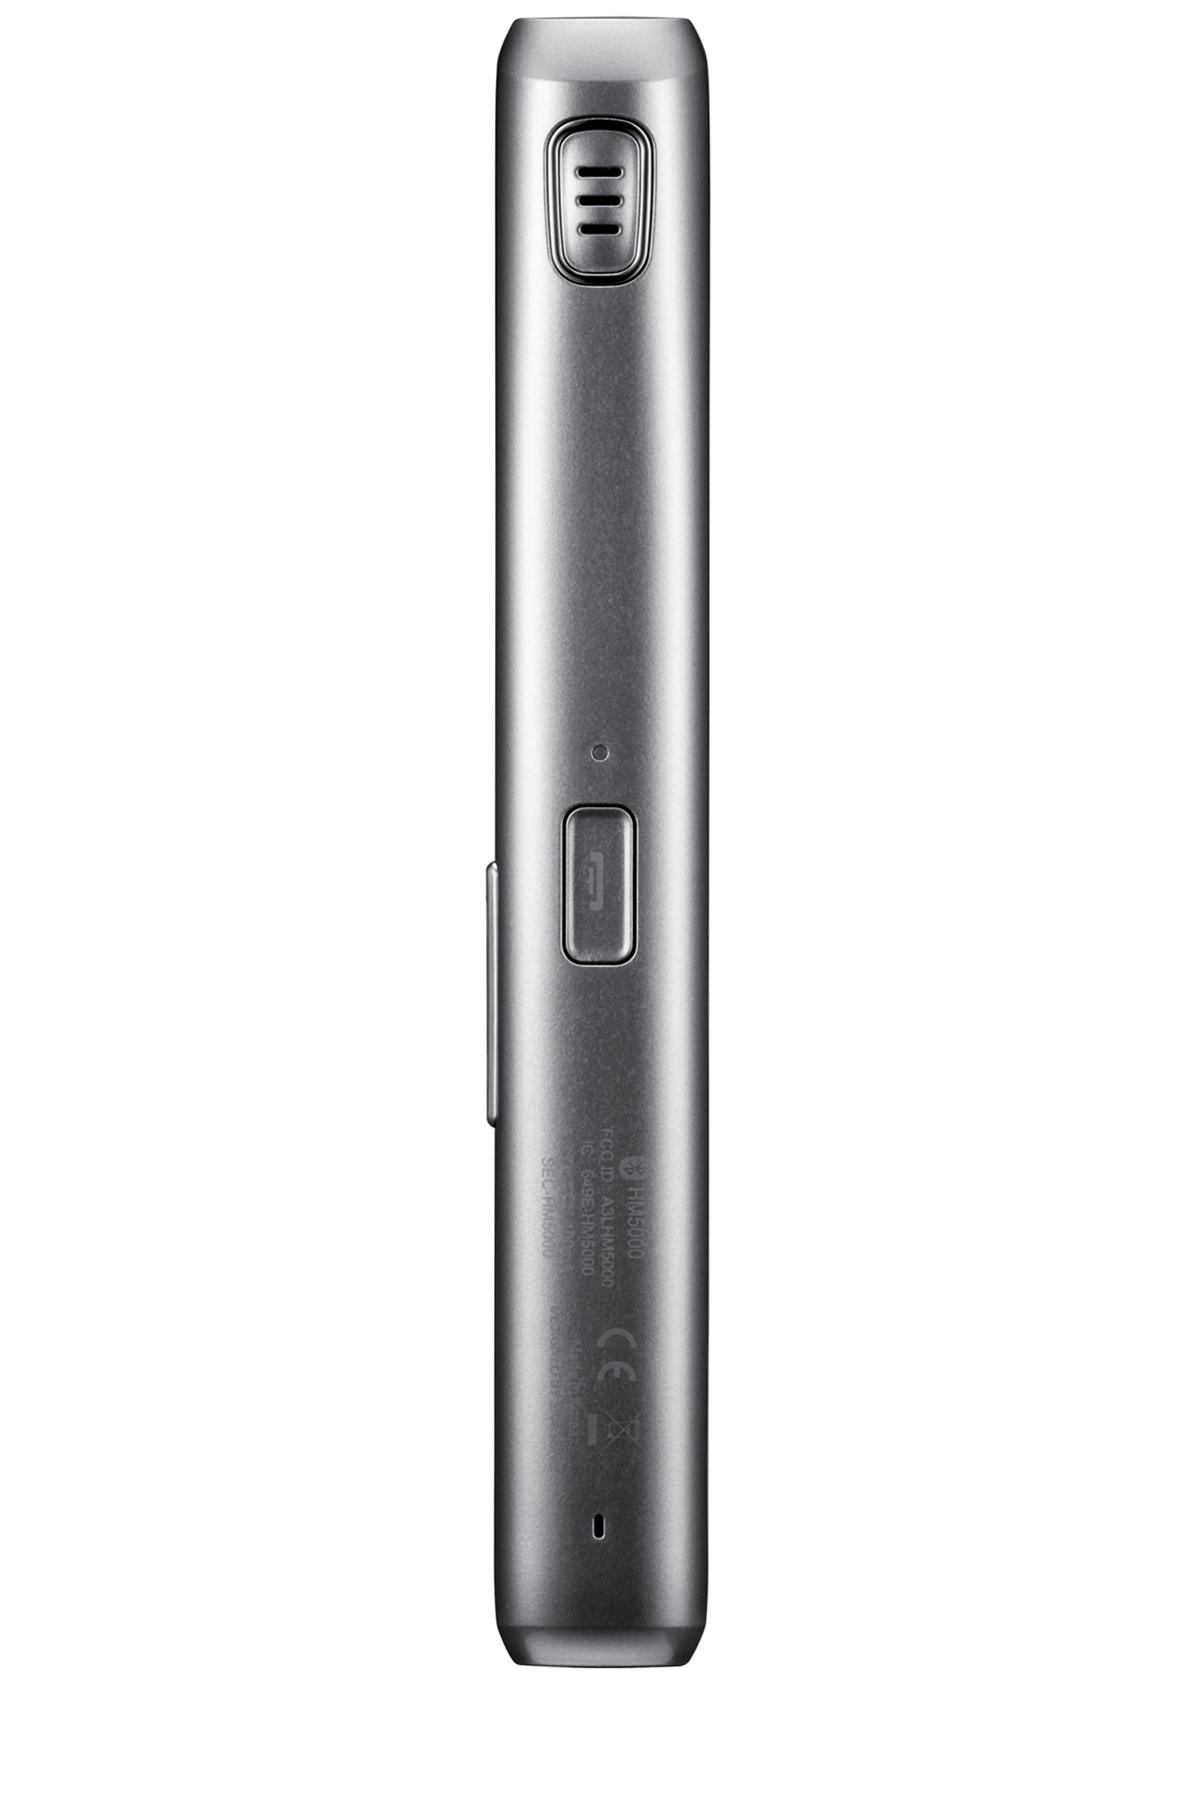 HM5000 Etuosa